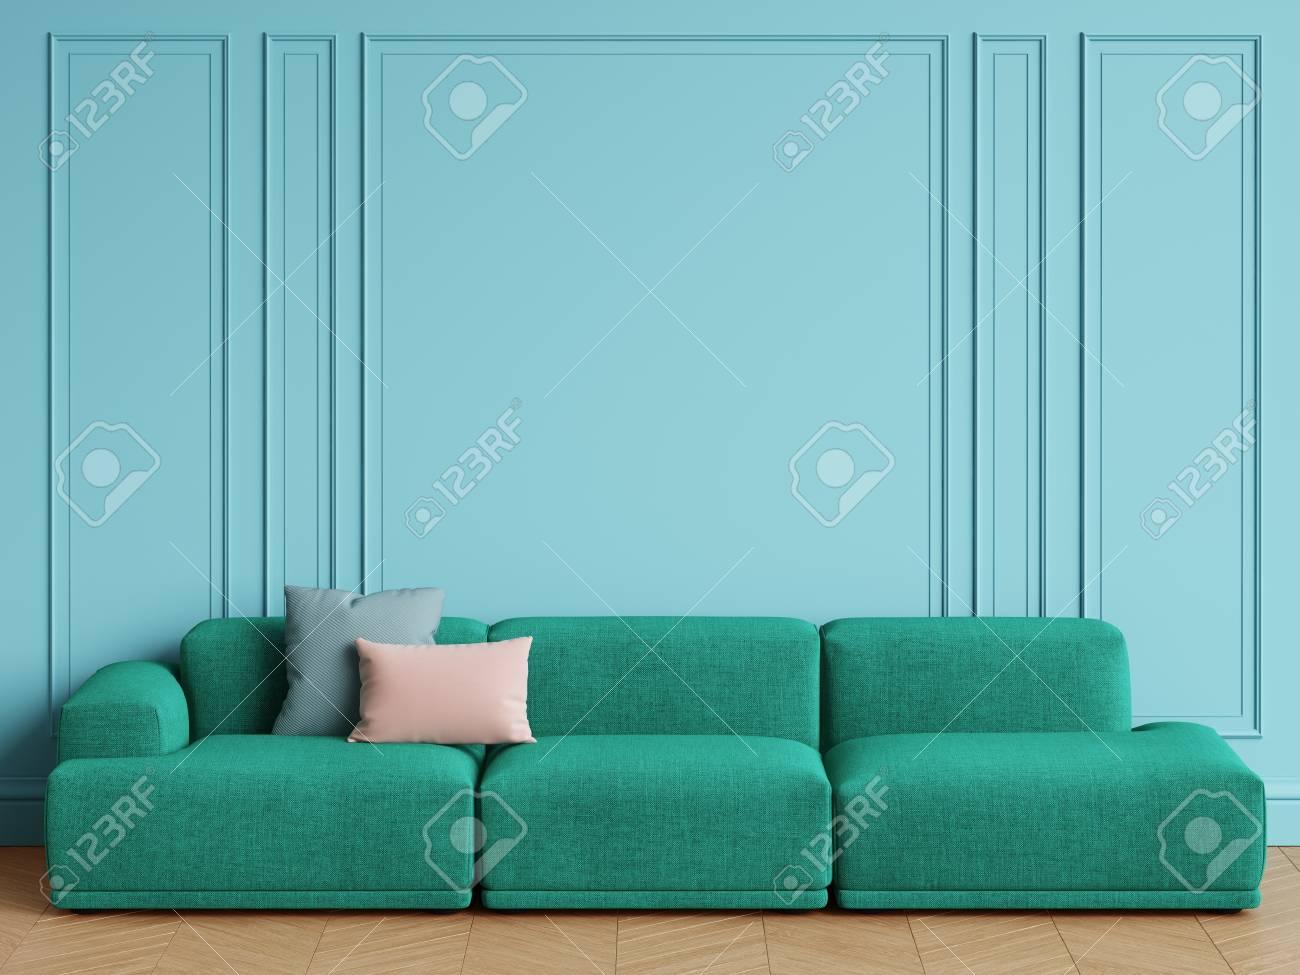 Illustration   Modern Scandinavian Design Emerald Green Sofa In Interior.  Blue Walls With Moldings,floor Parquet Herringbone.Copy Space,mockup  Interior.